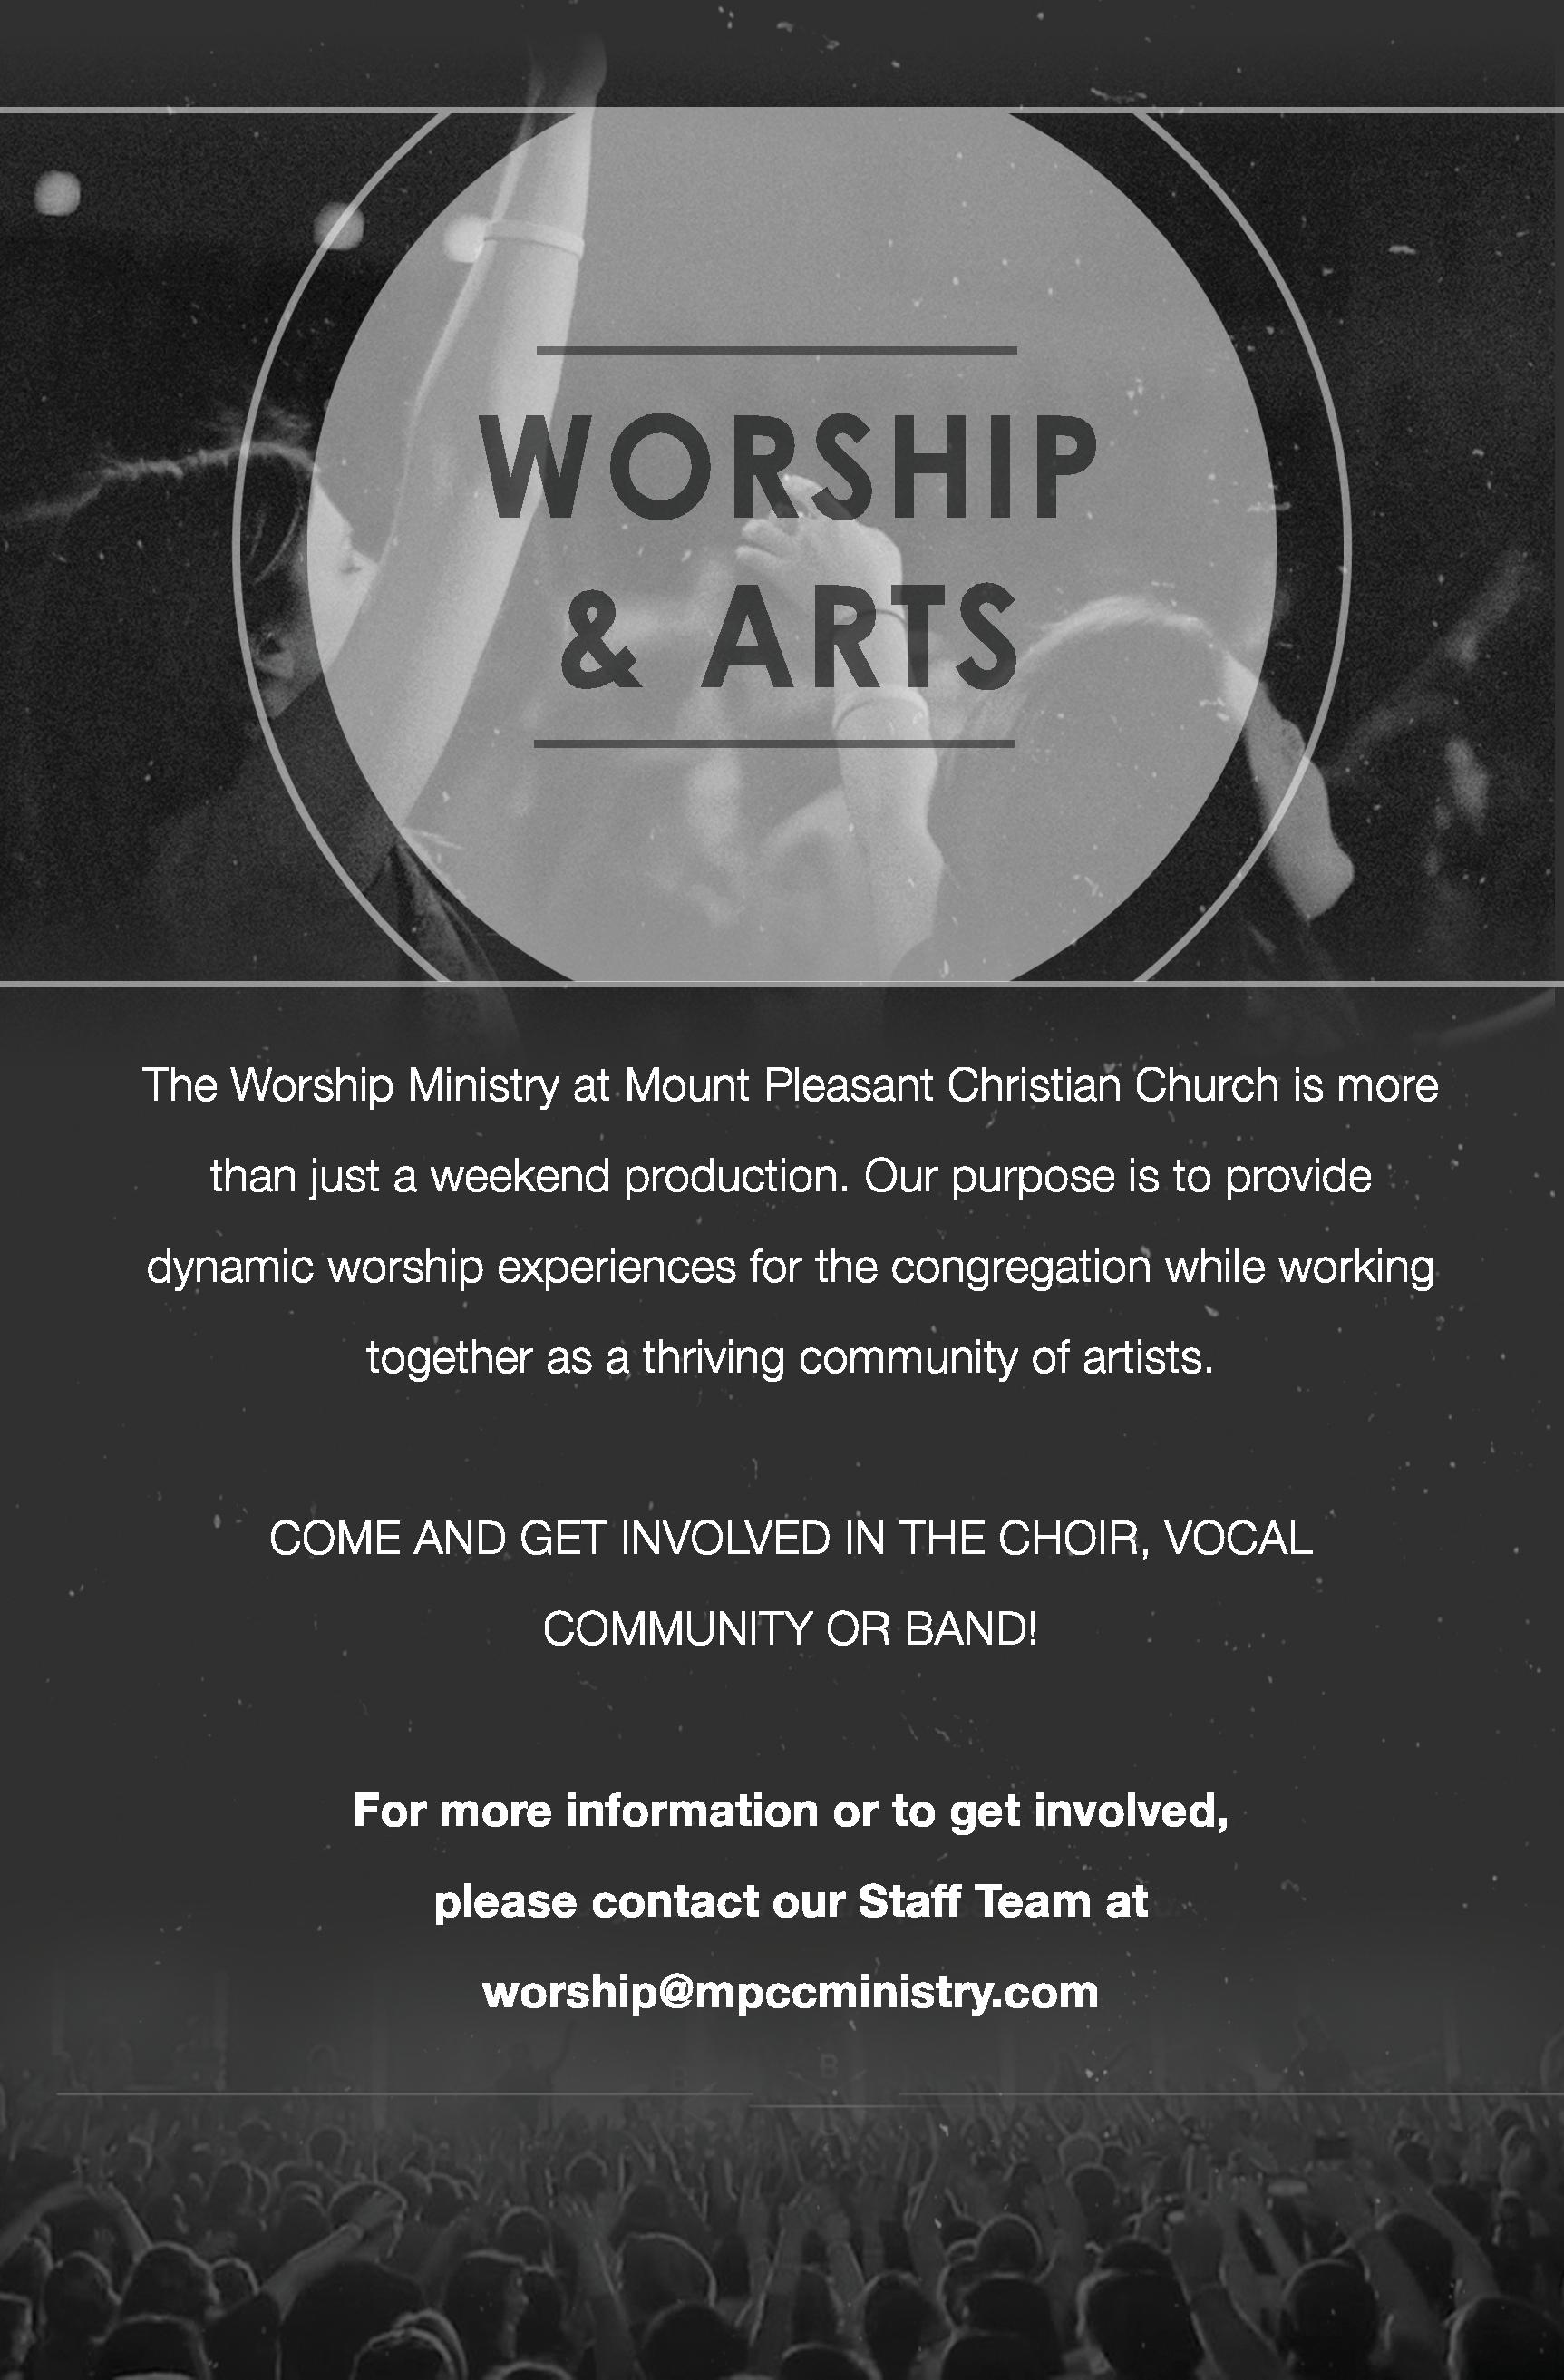 Worship Arts Ministry